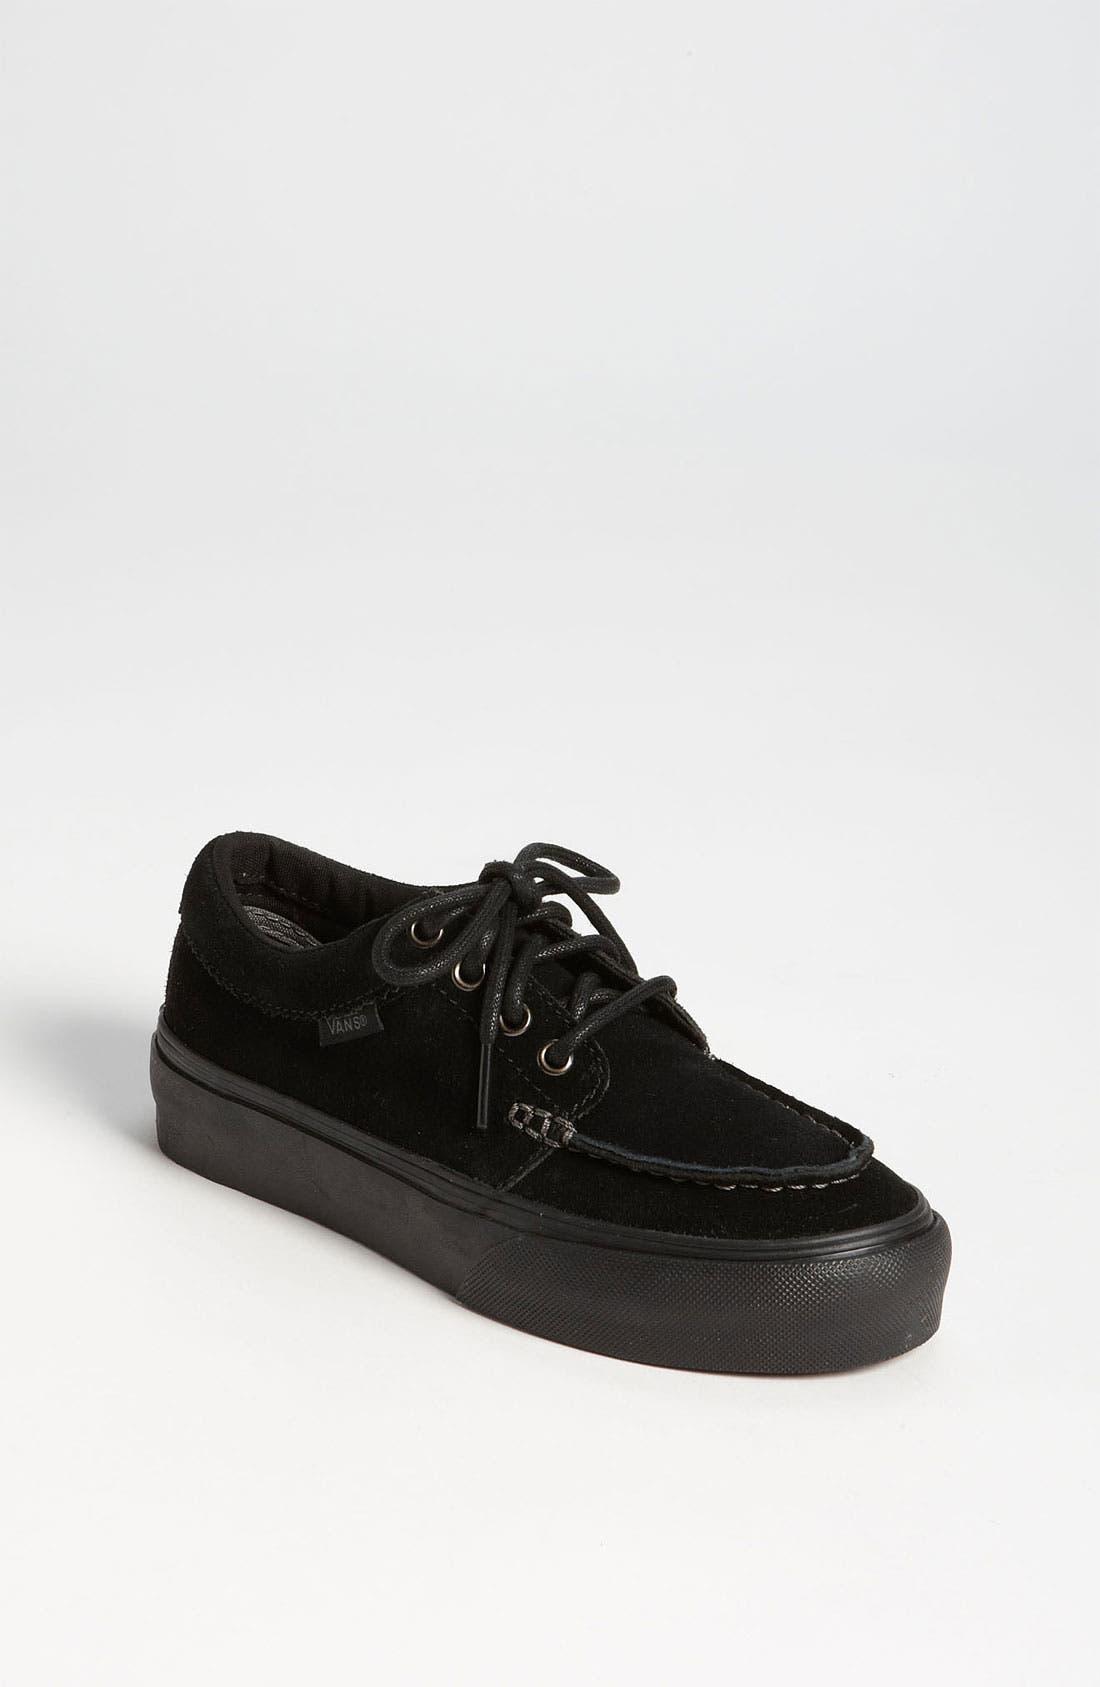 Main Image - Vans '106 Moc' Sneaker (Baby, Walker, Toddler, Little Kid & Big Kid)